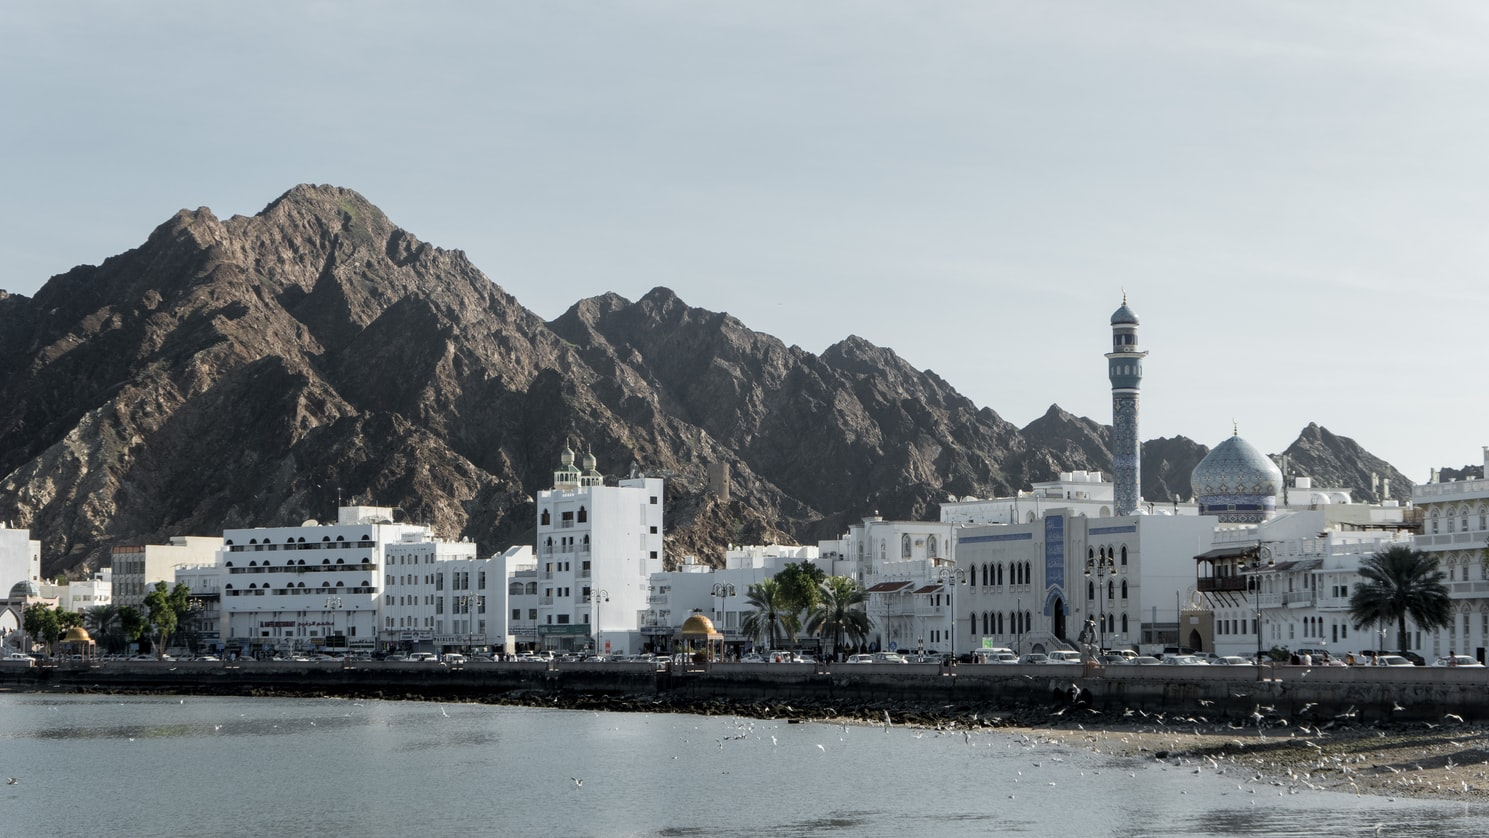 Auslandspraktikum in Oman - Makat